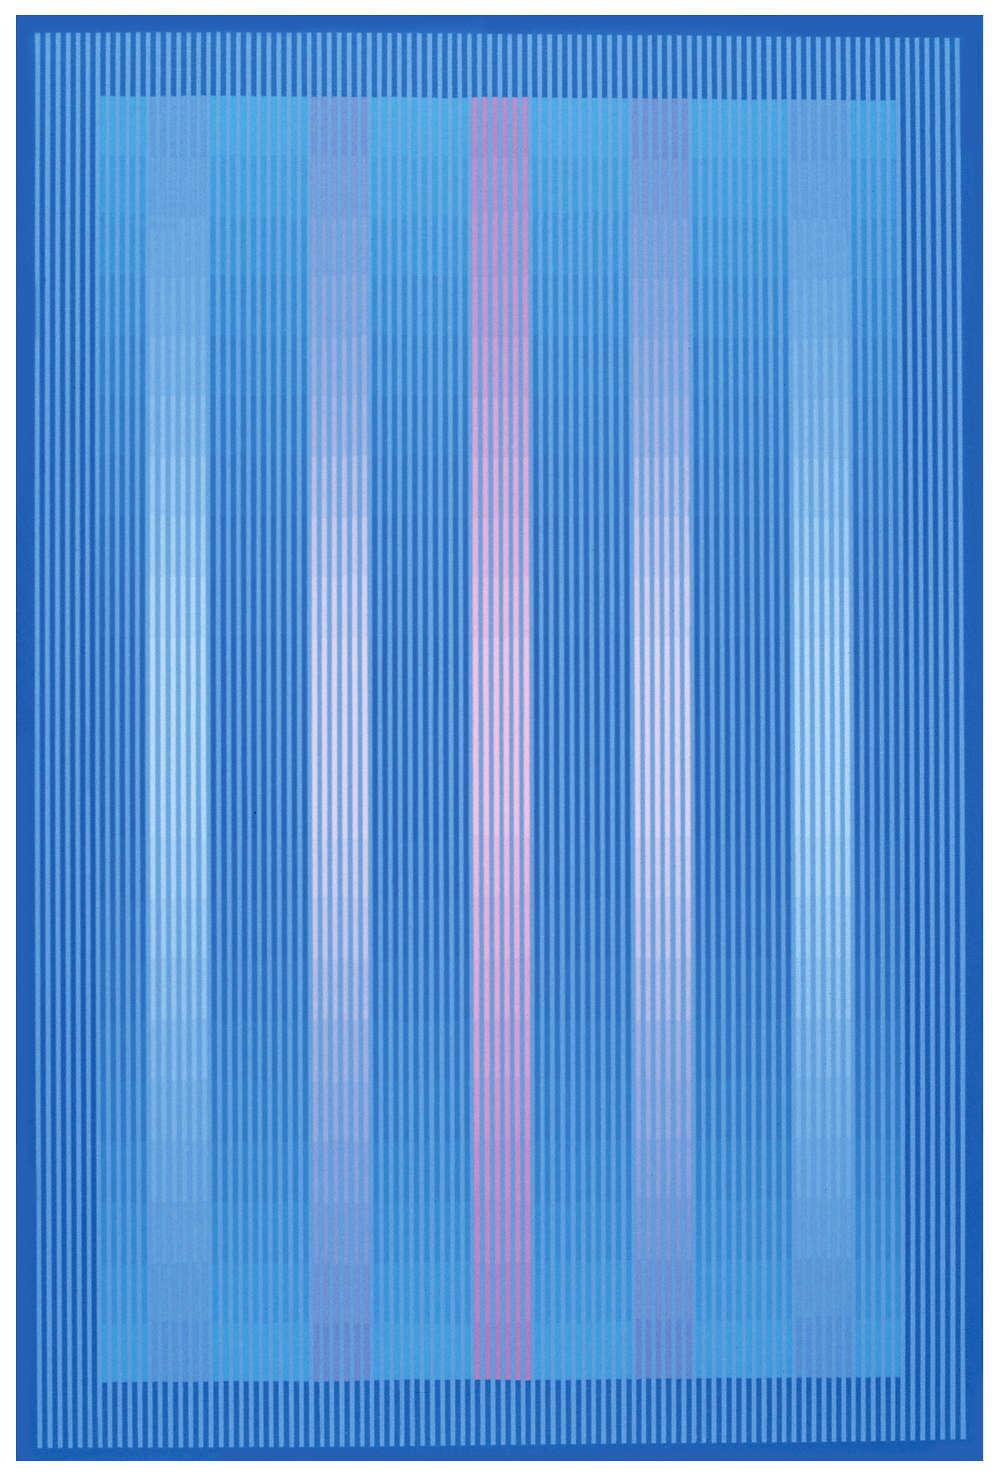 Julian Stańczak, Blue Crystal, 1985. Acrylic on canvas, 91 x 61 cm, 35 3/4 x 24 in.